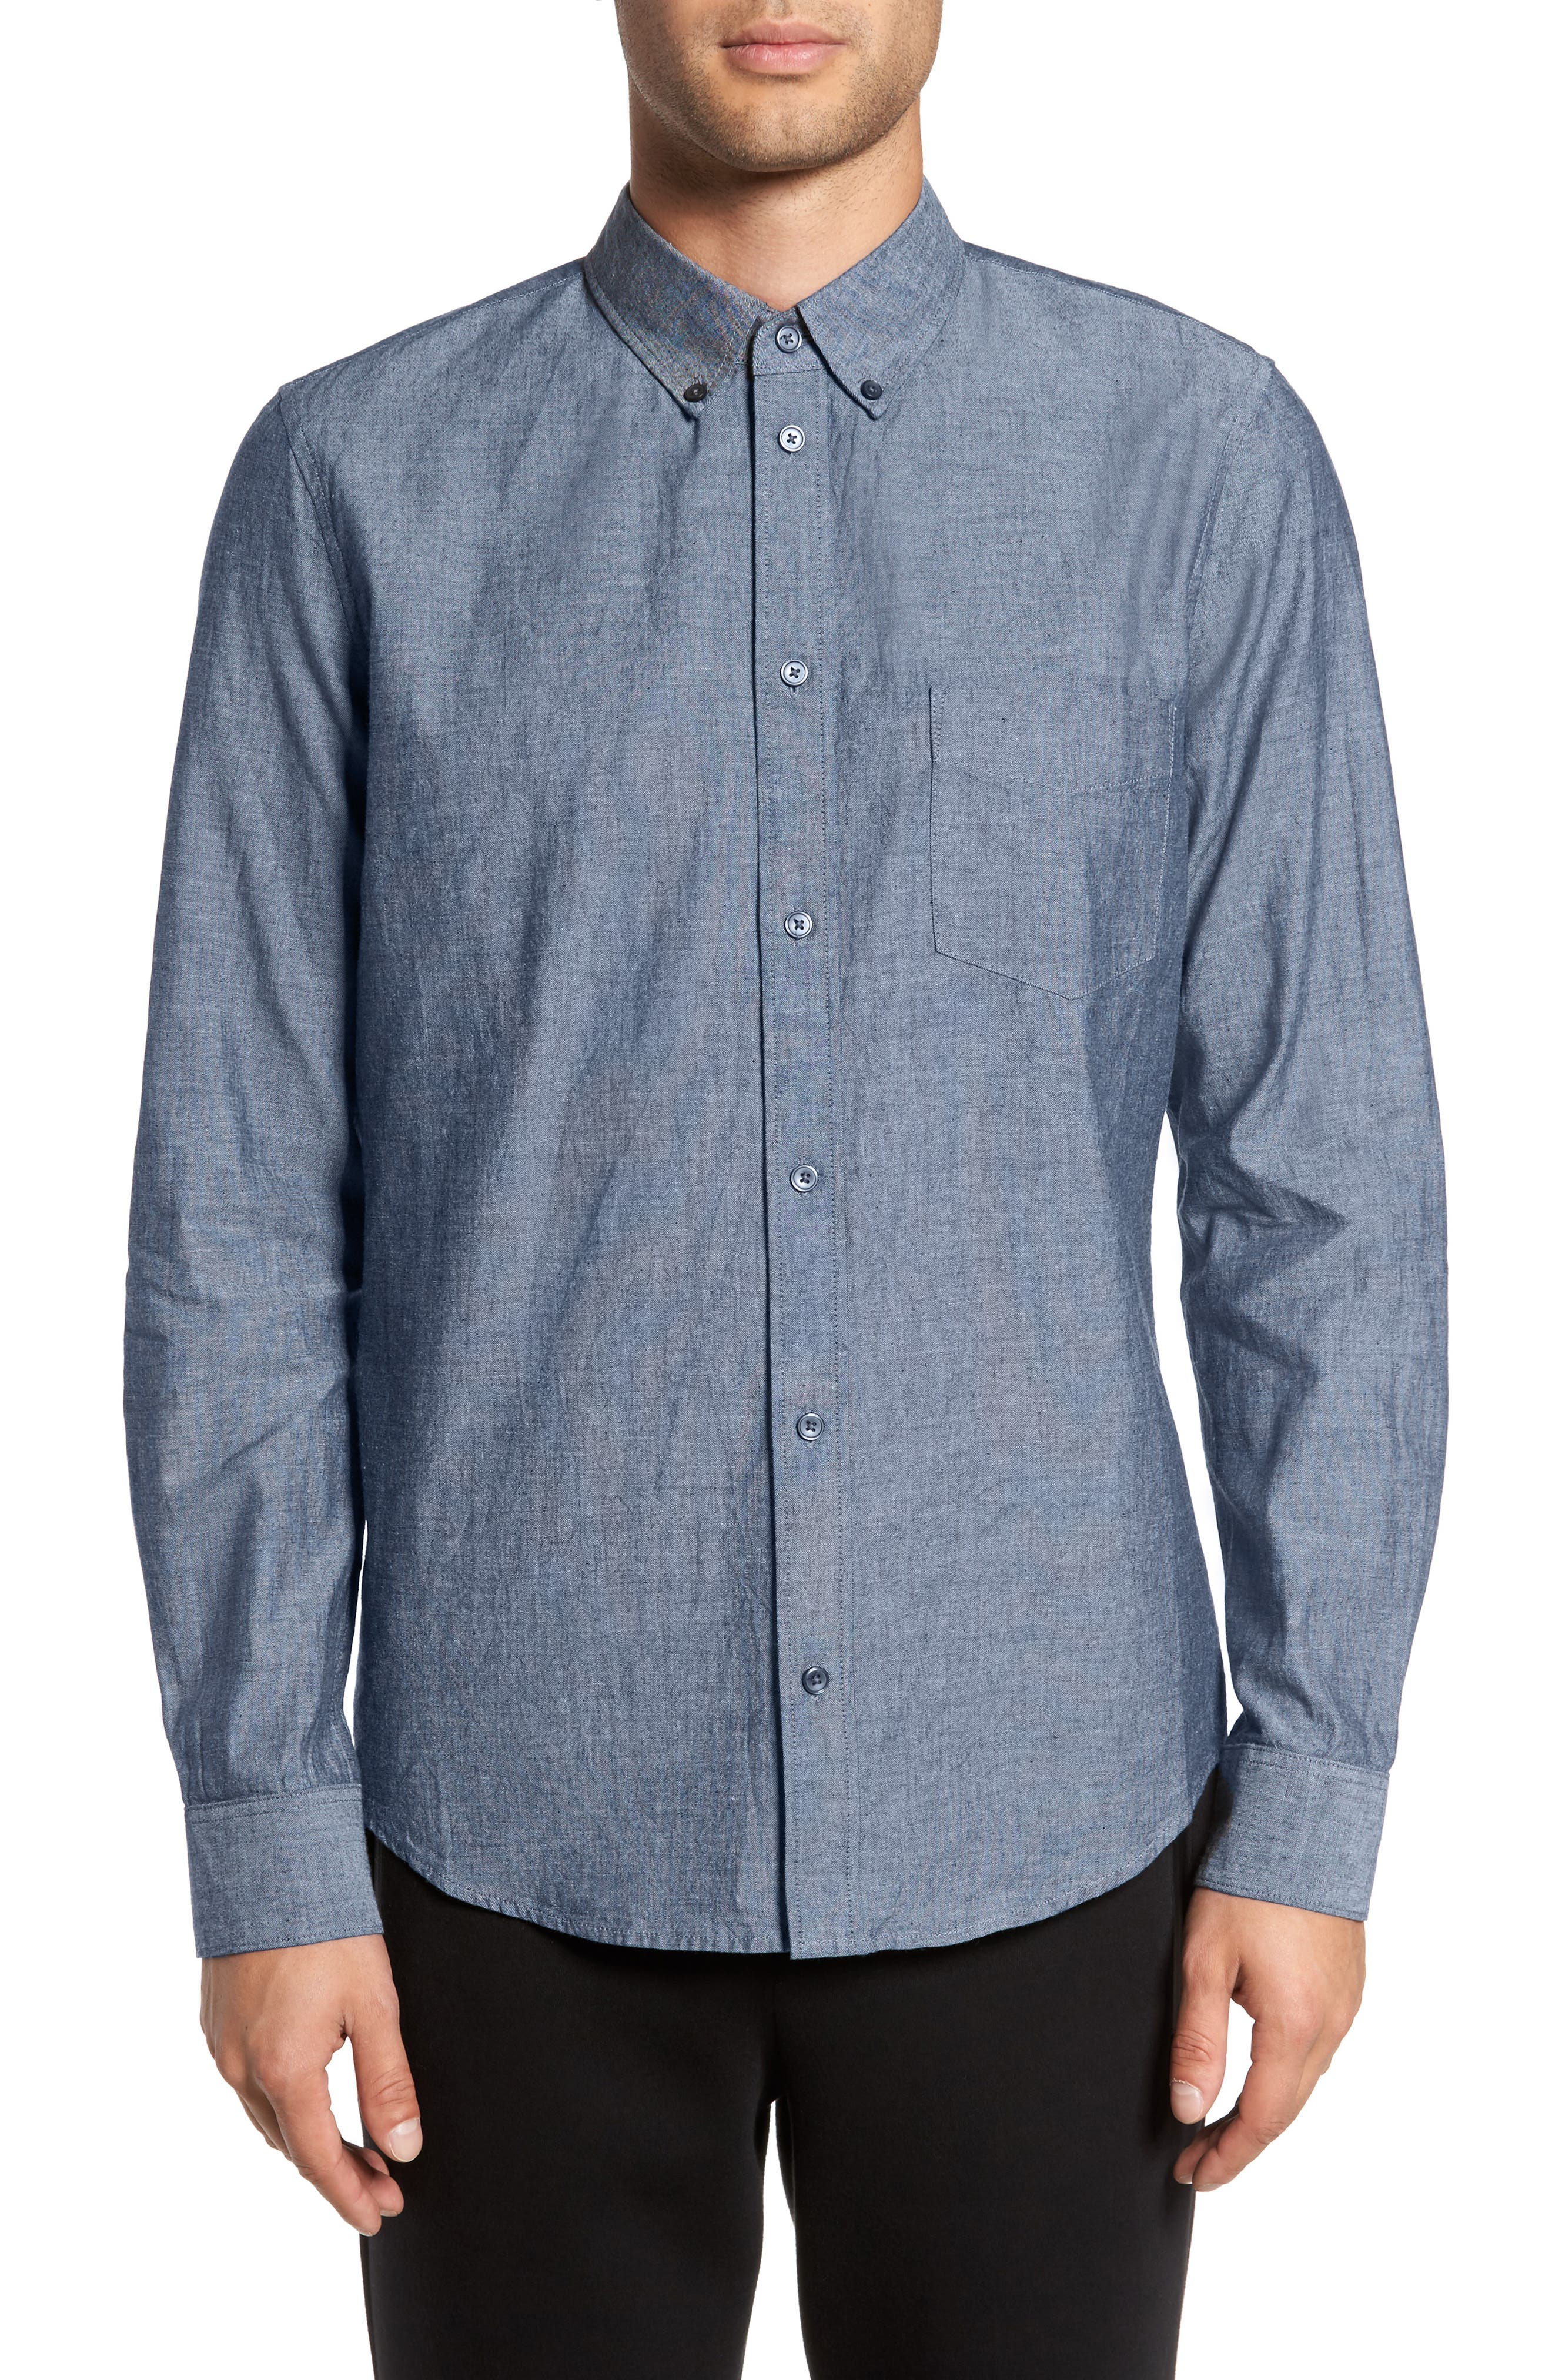 Main Image - Everlane The Slim Fit Chambray Shirt